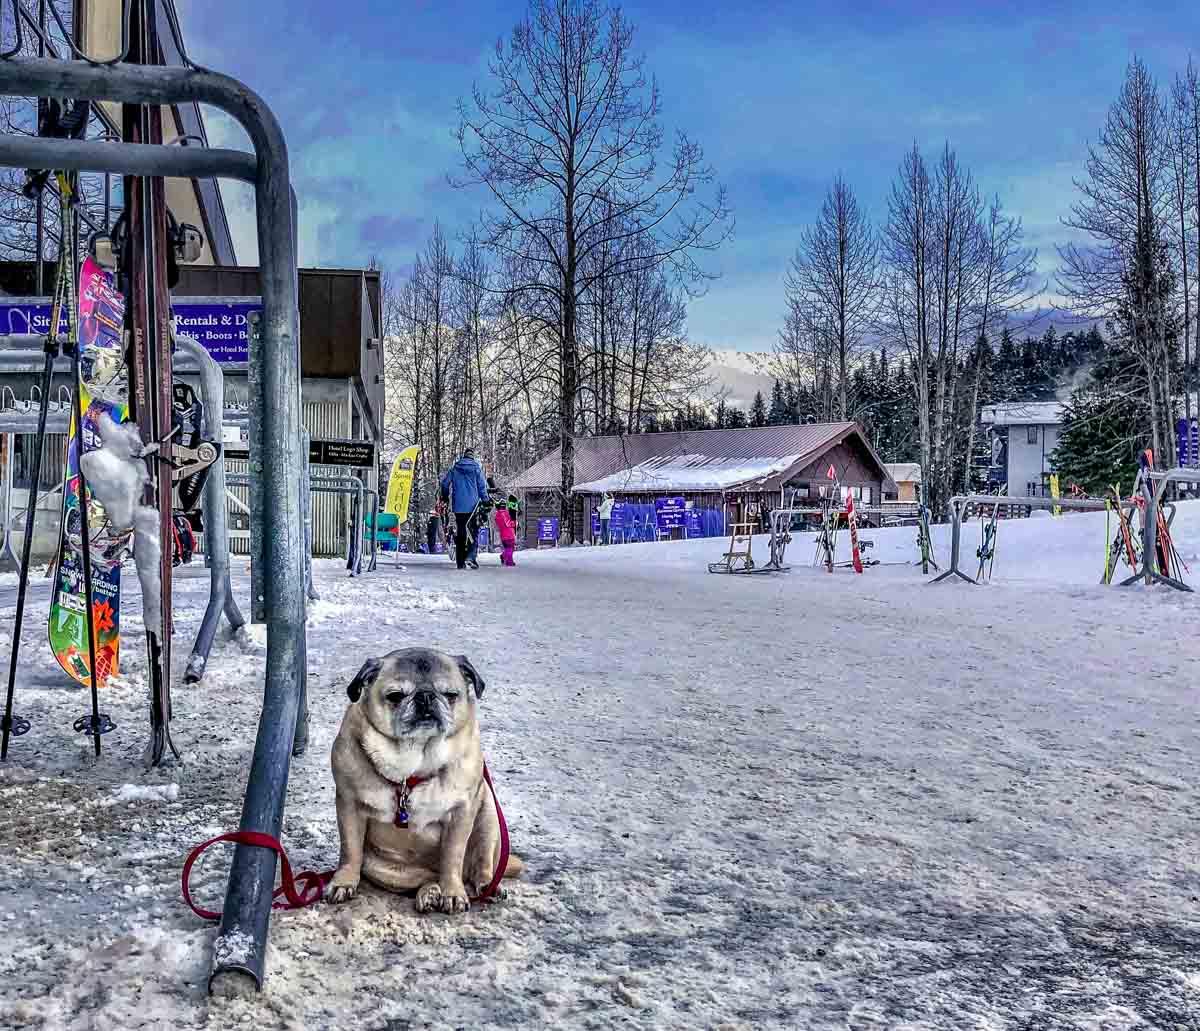 photo-2-1 Alaska in the Winter - Amazing Scenery